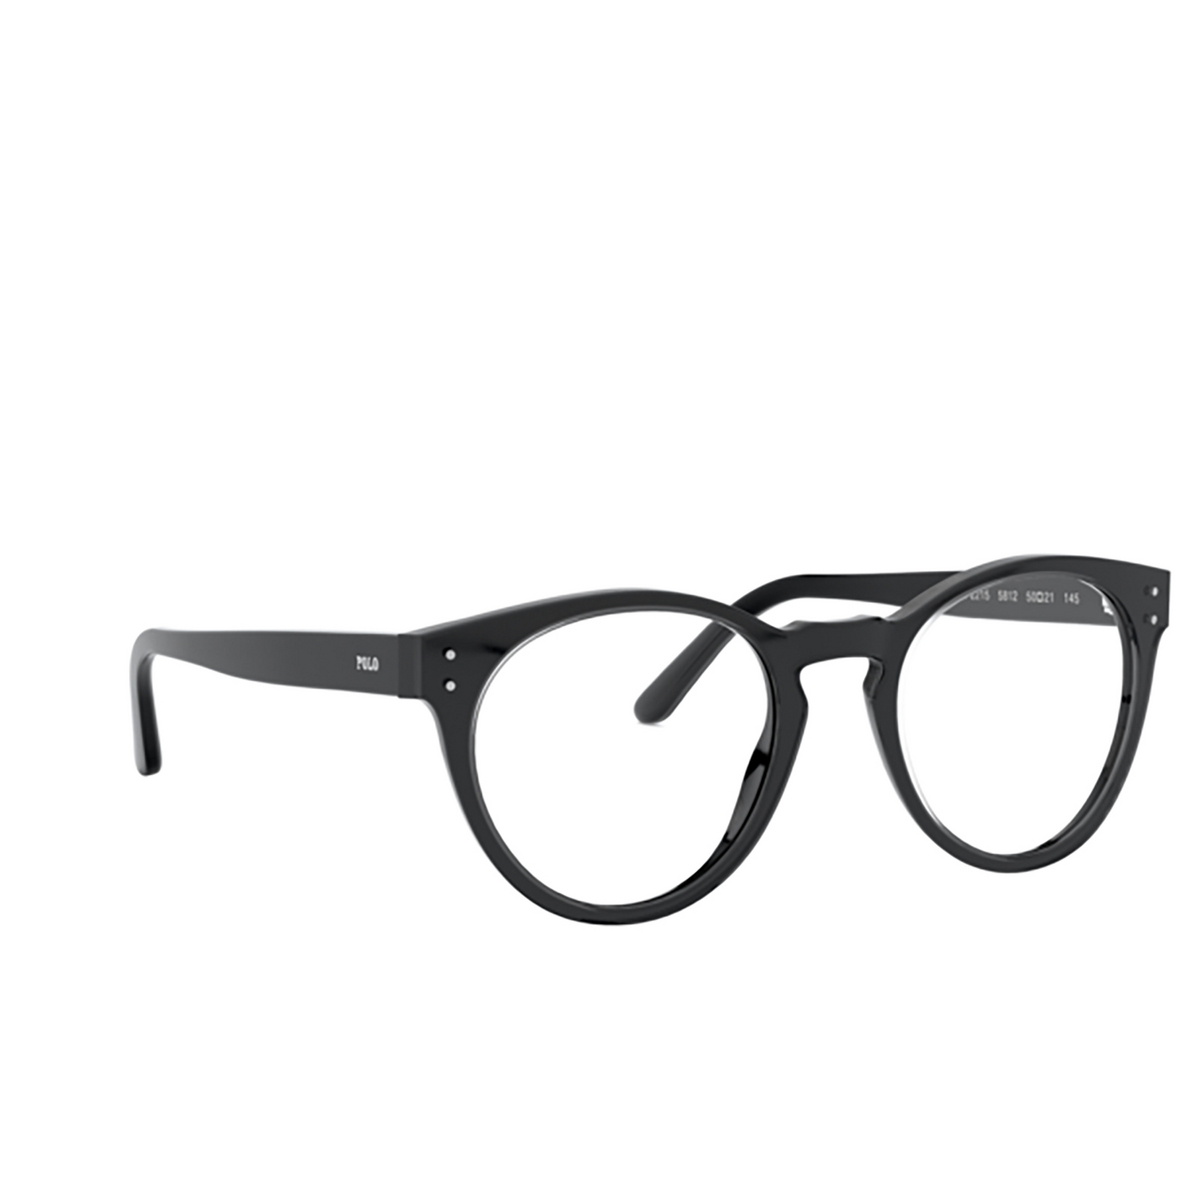 Polo Ralph Lauren® Round Eyeglasses: PH2215 color Shiny Crystal On Black 5812.